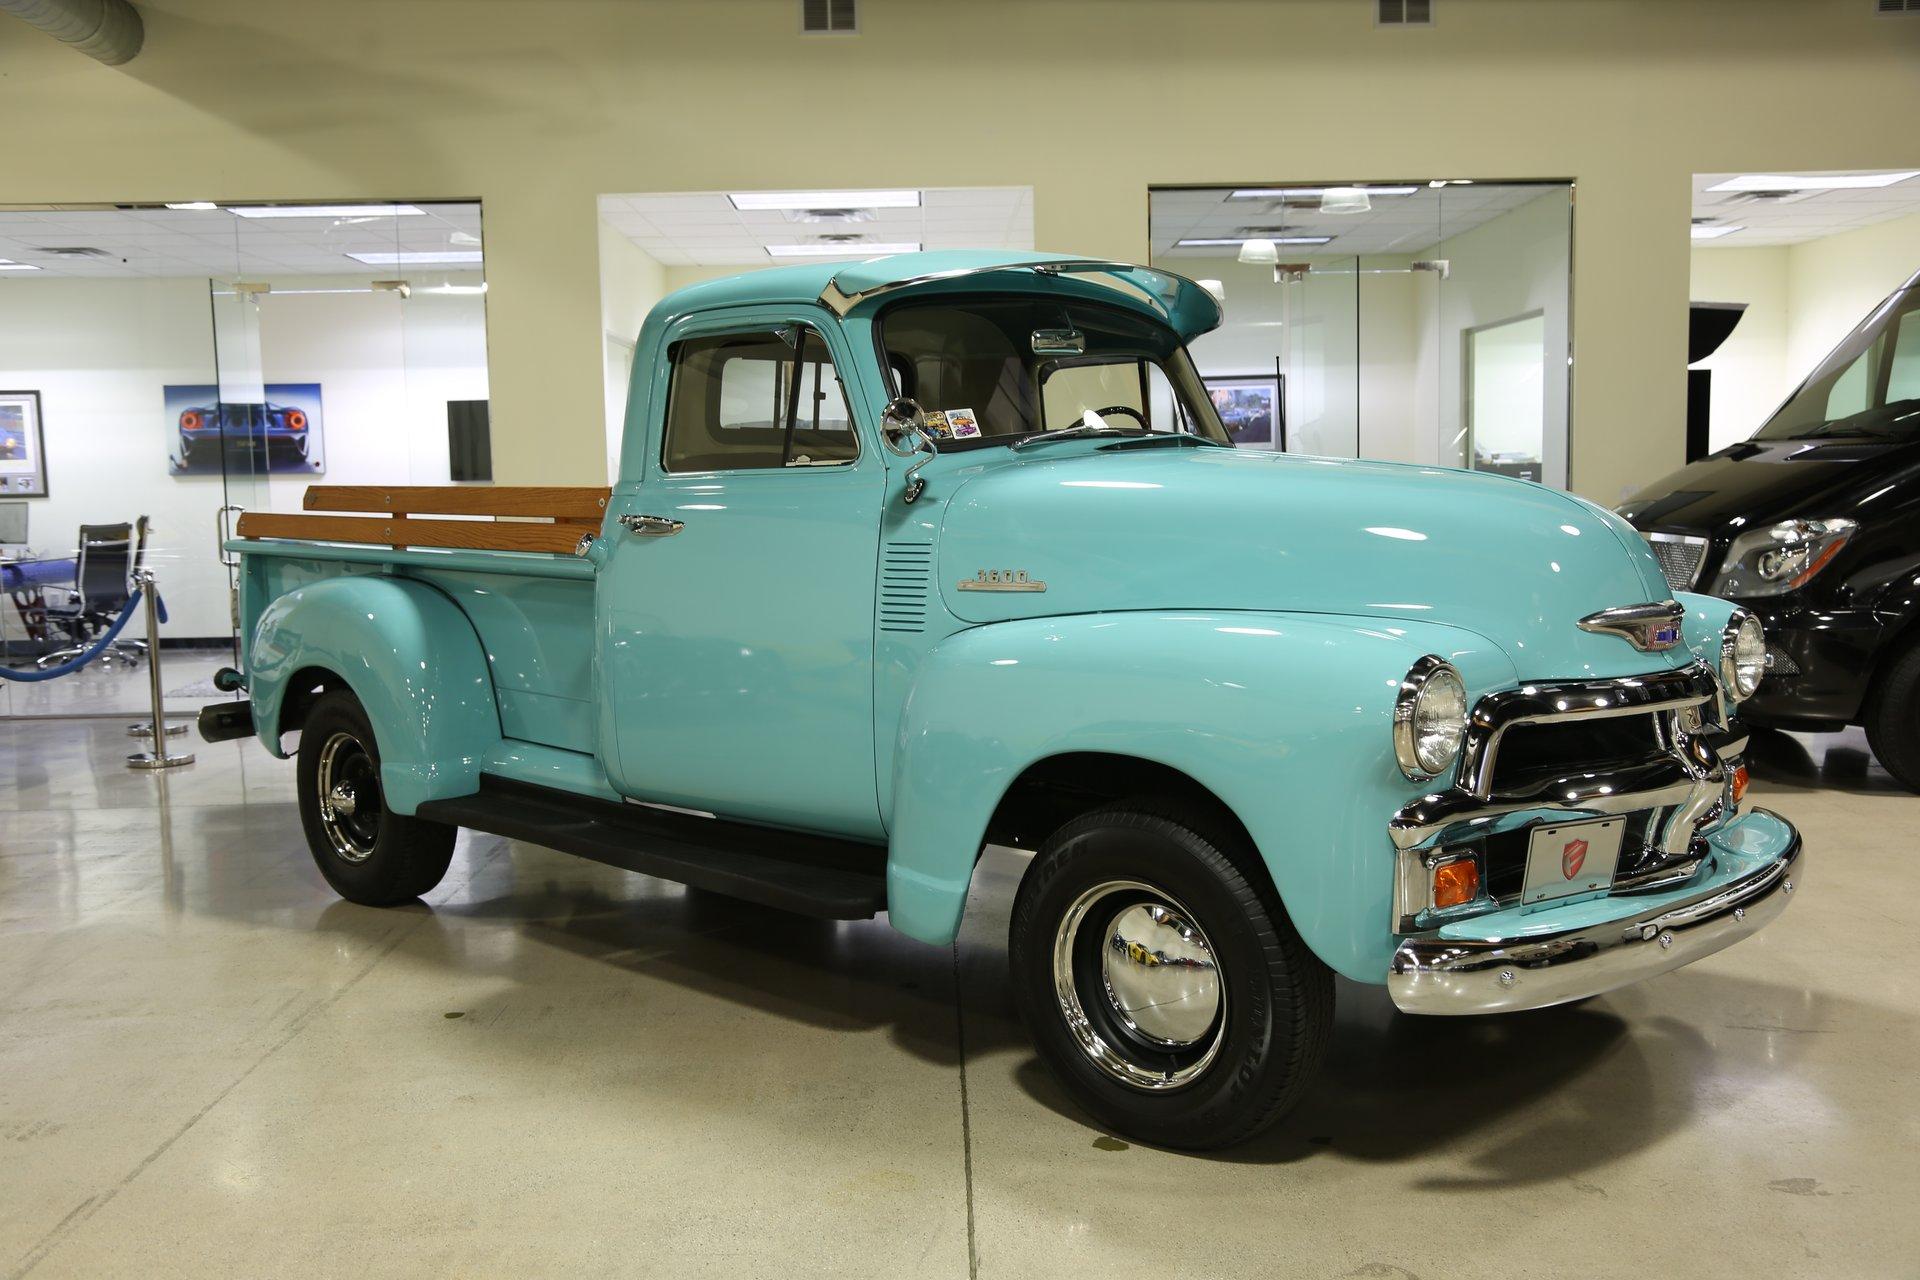 1954 Chevrolet 3600 Fusion Luxury Motors Pick Up